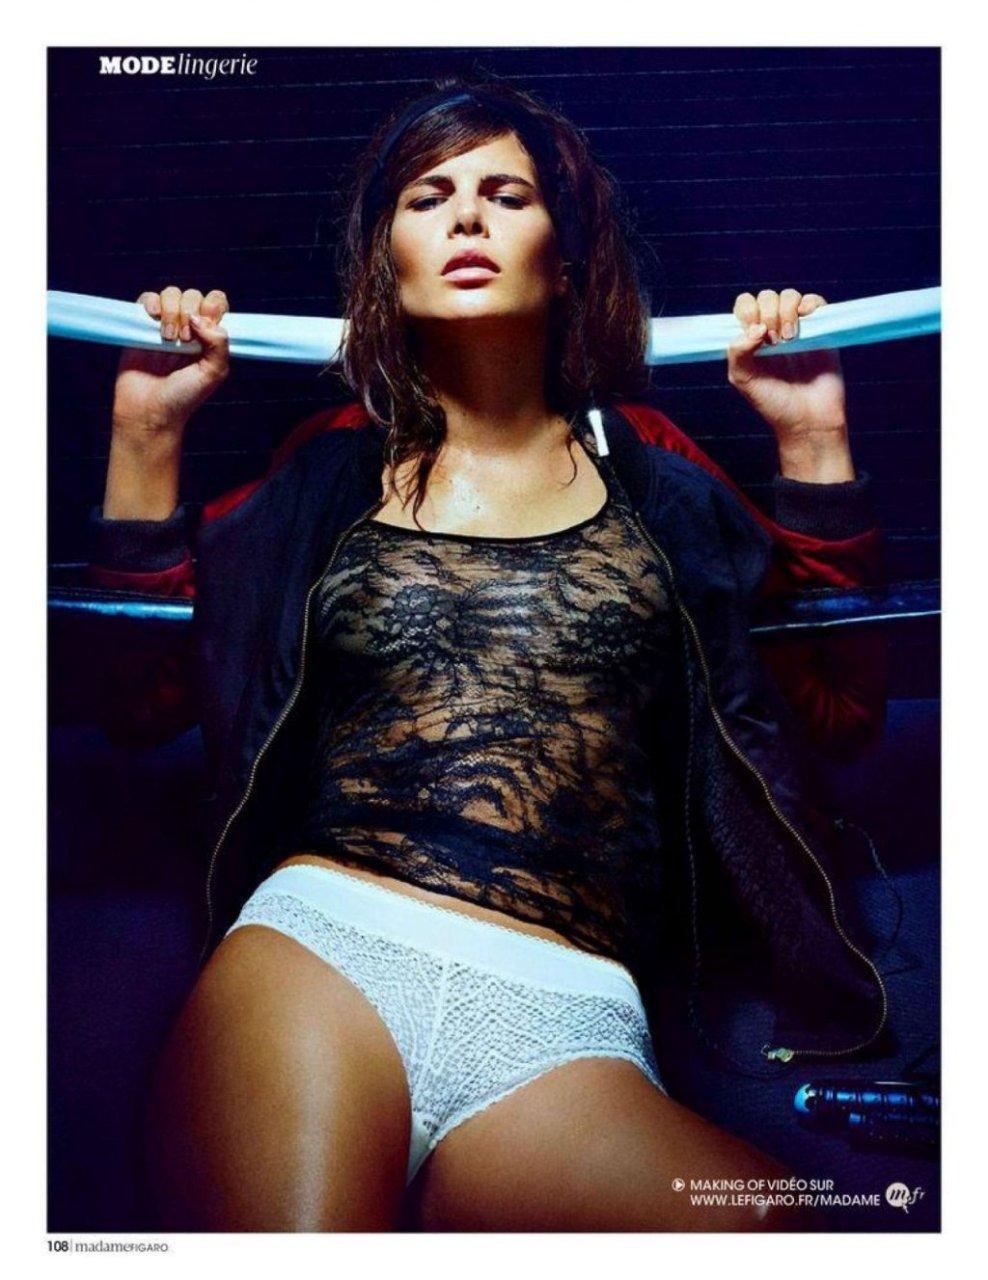 Emilia clarke nude sex scene game thrones series,Anna Shaffer. 2018-2019 celebrityes photos leaks! Porn gallery Aurelie malta topless,Holly Randall Nude Photos and Videos